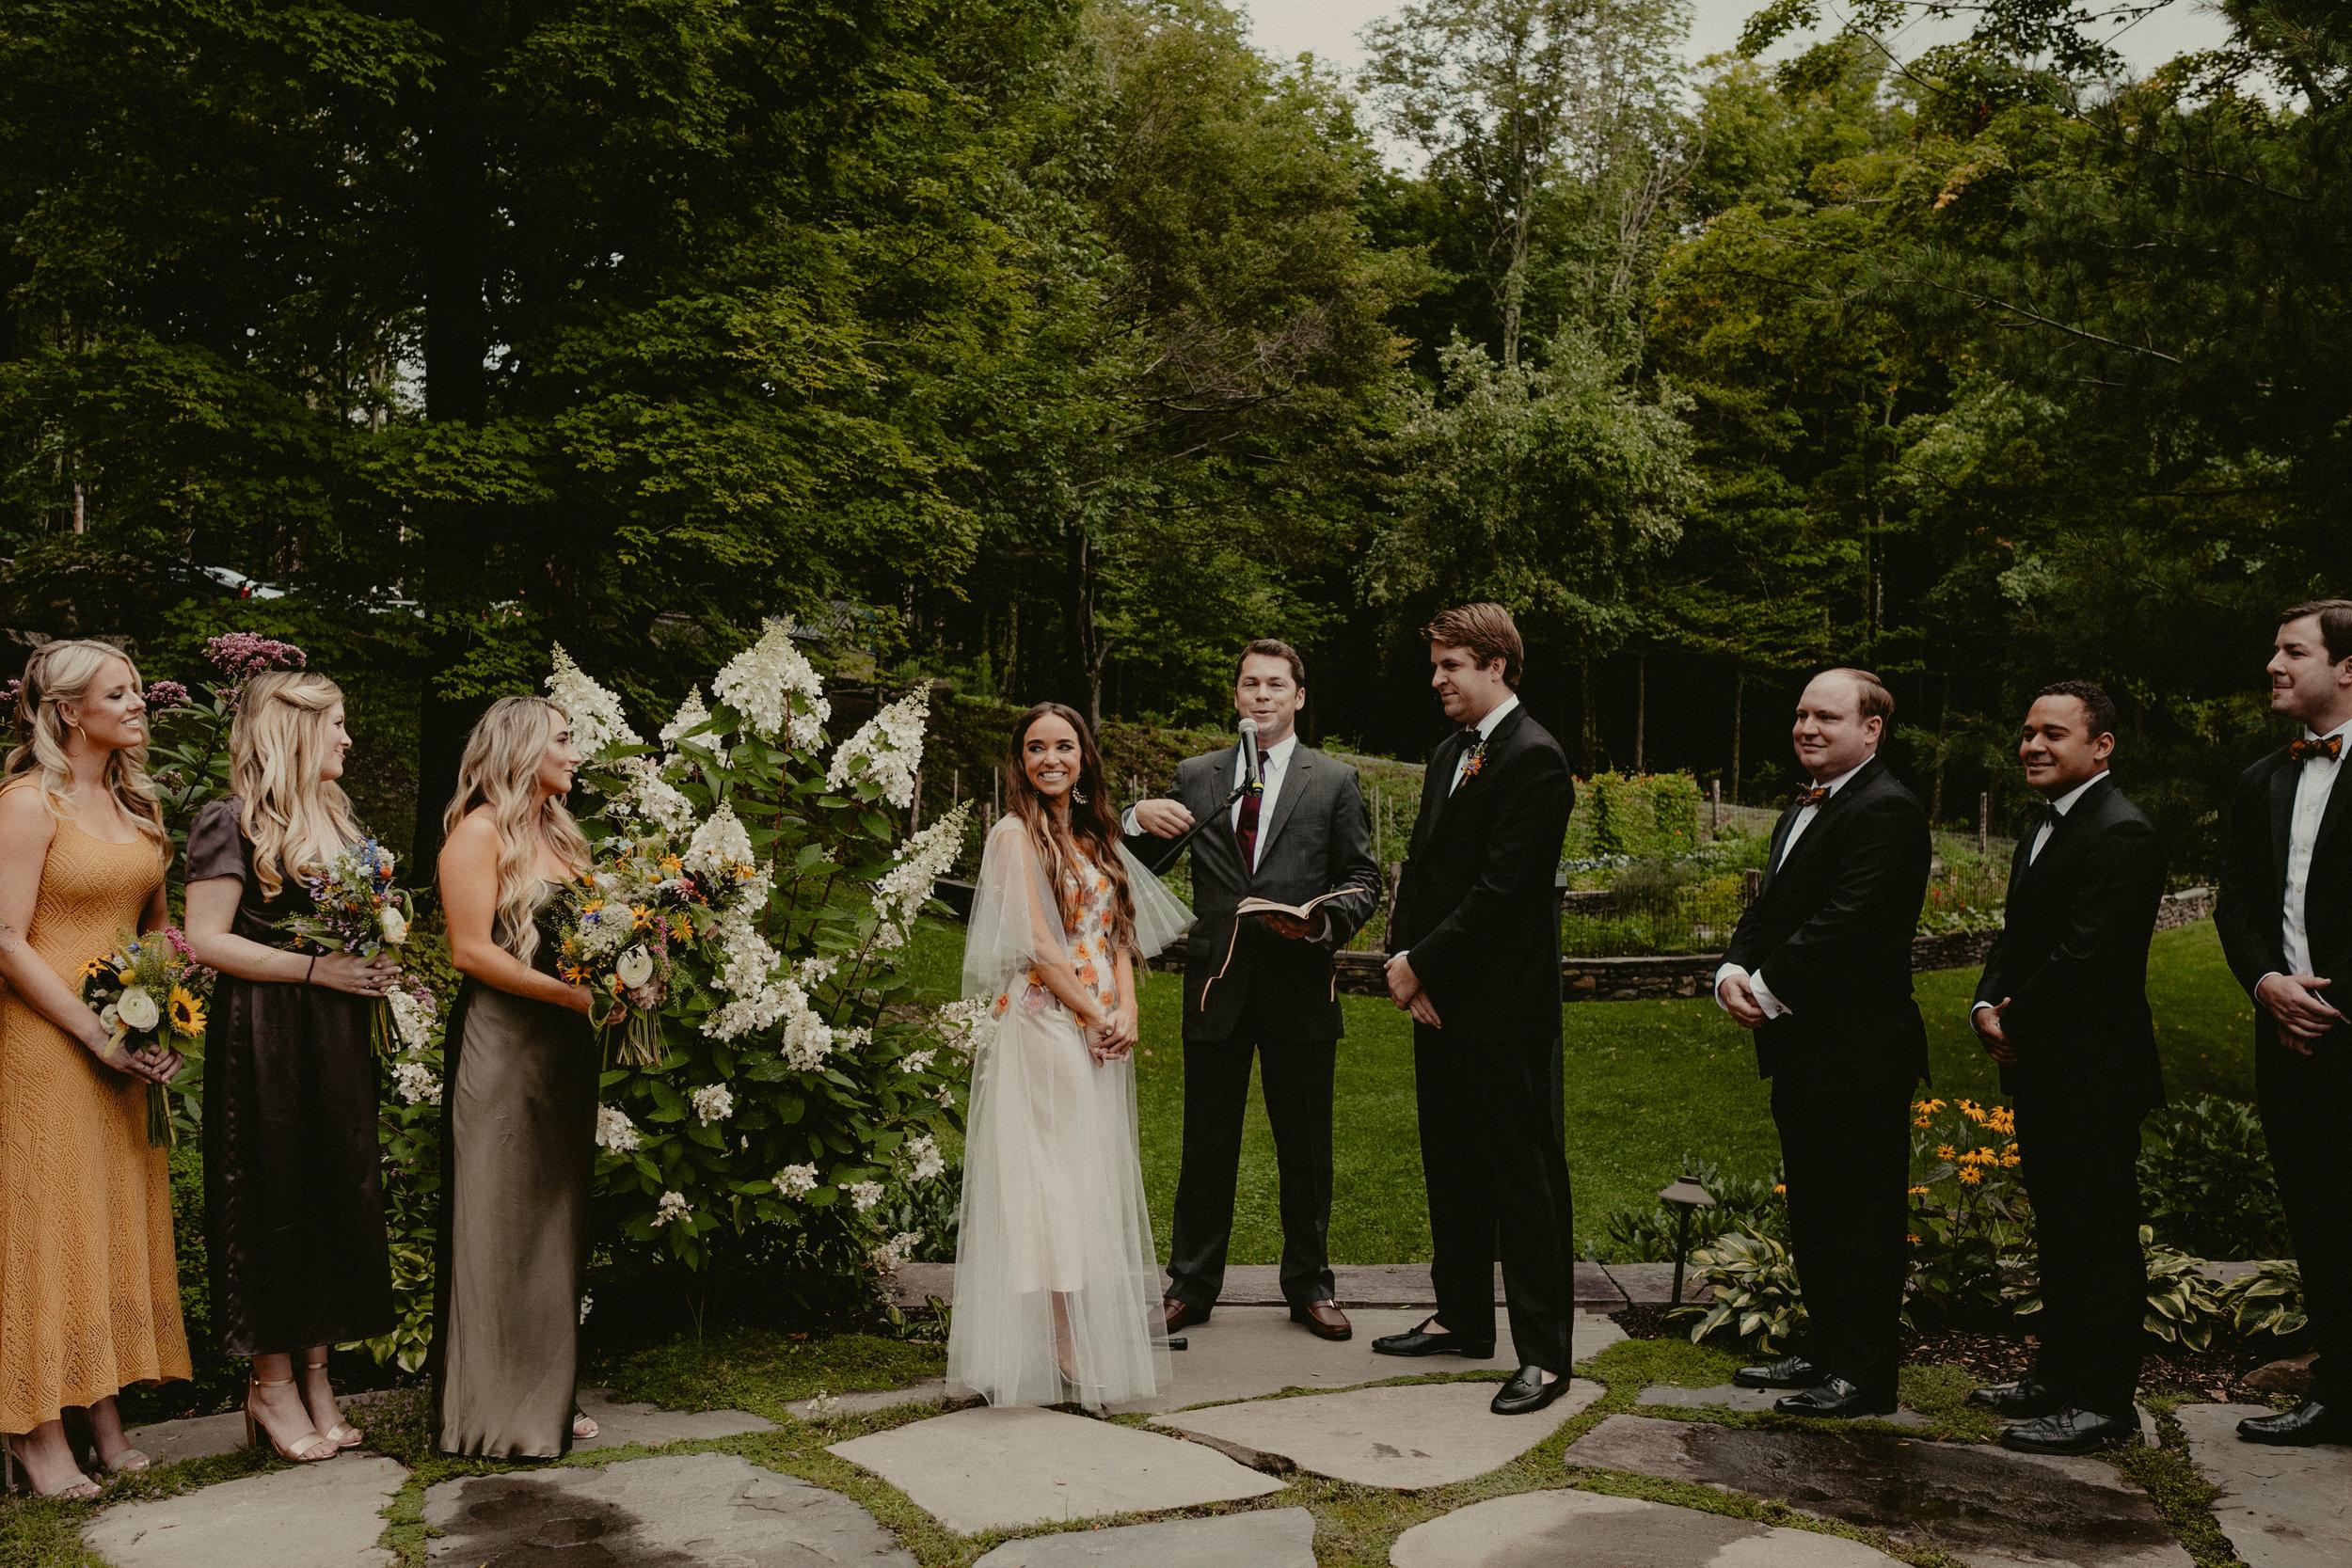 DEER_MOUNTAIN_INN_WEDDING_CHELLISE_MICHAEL_PHOTOGRAPHY-1356.jpg